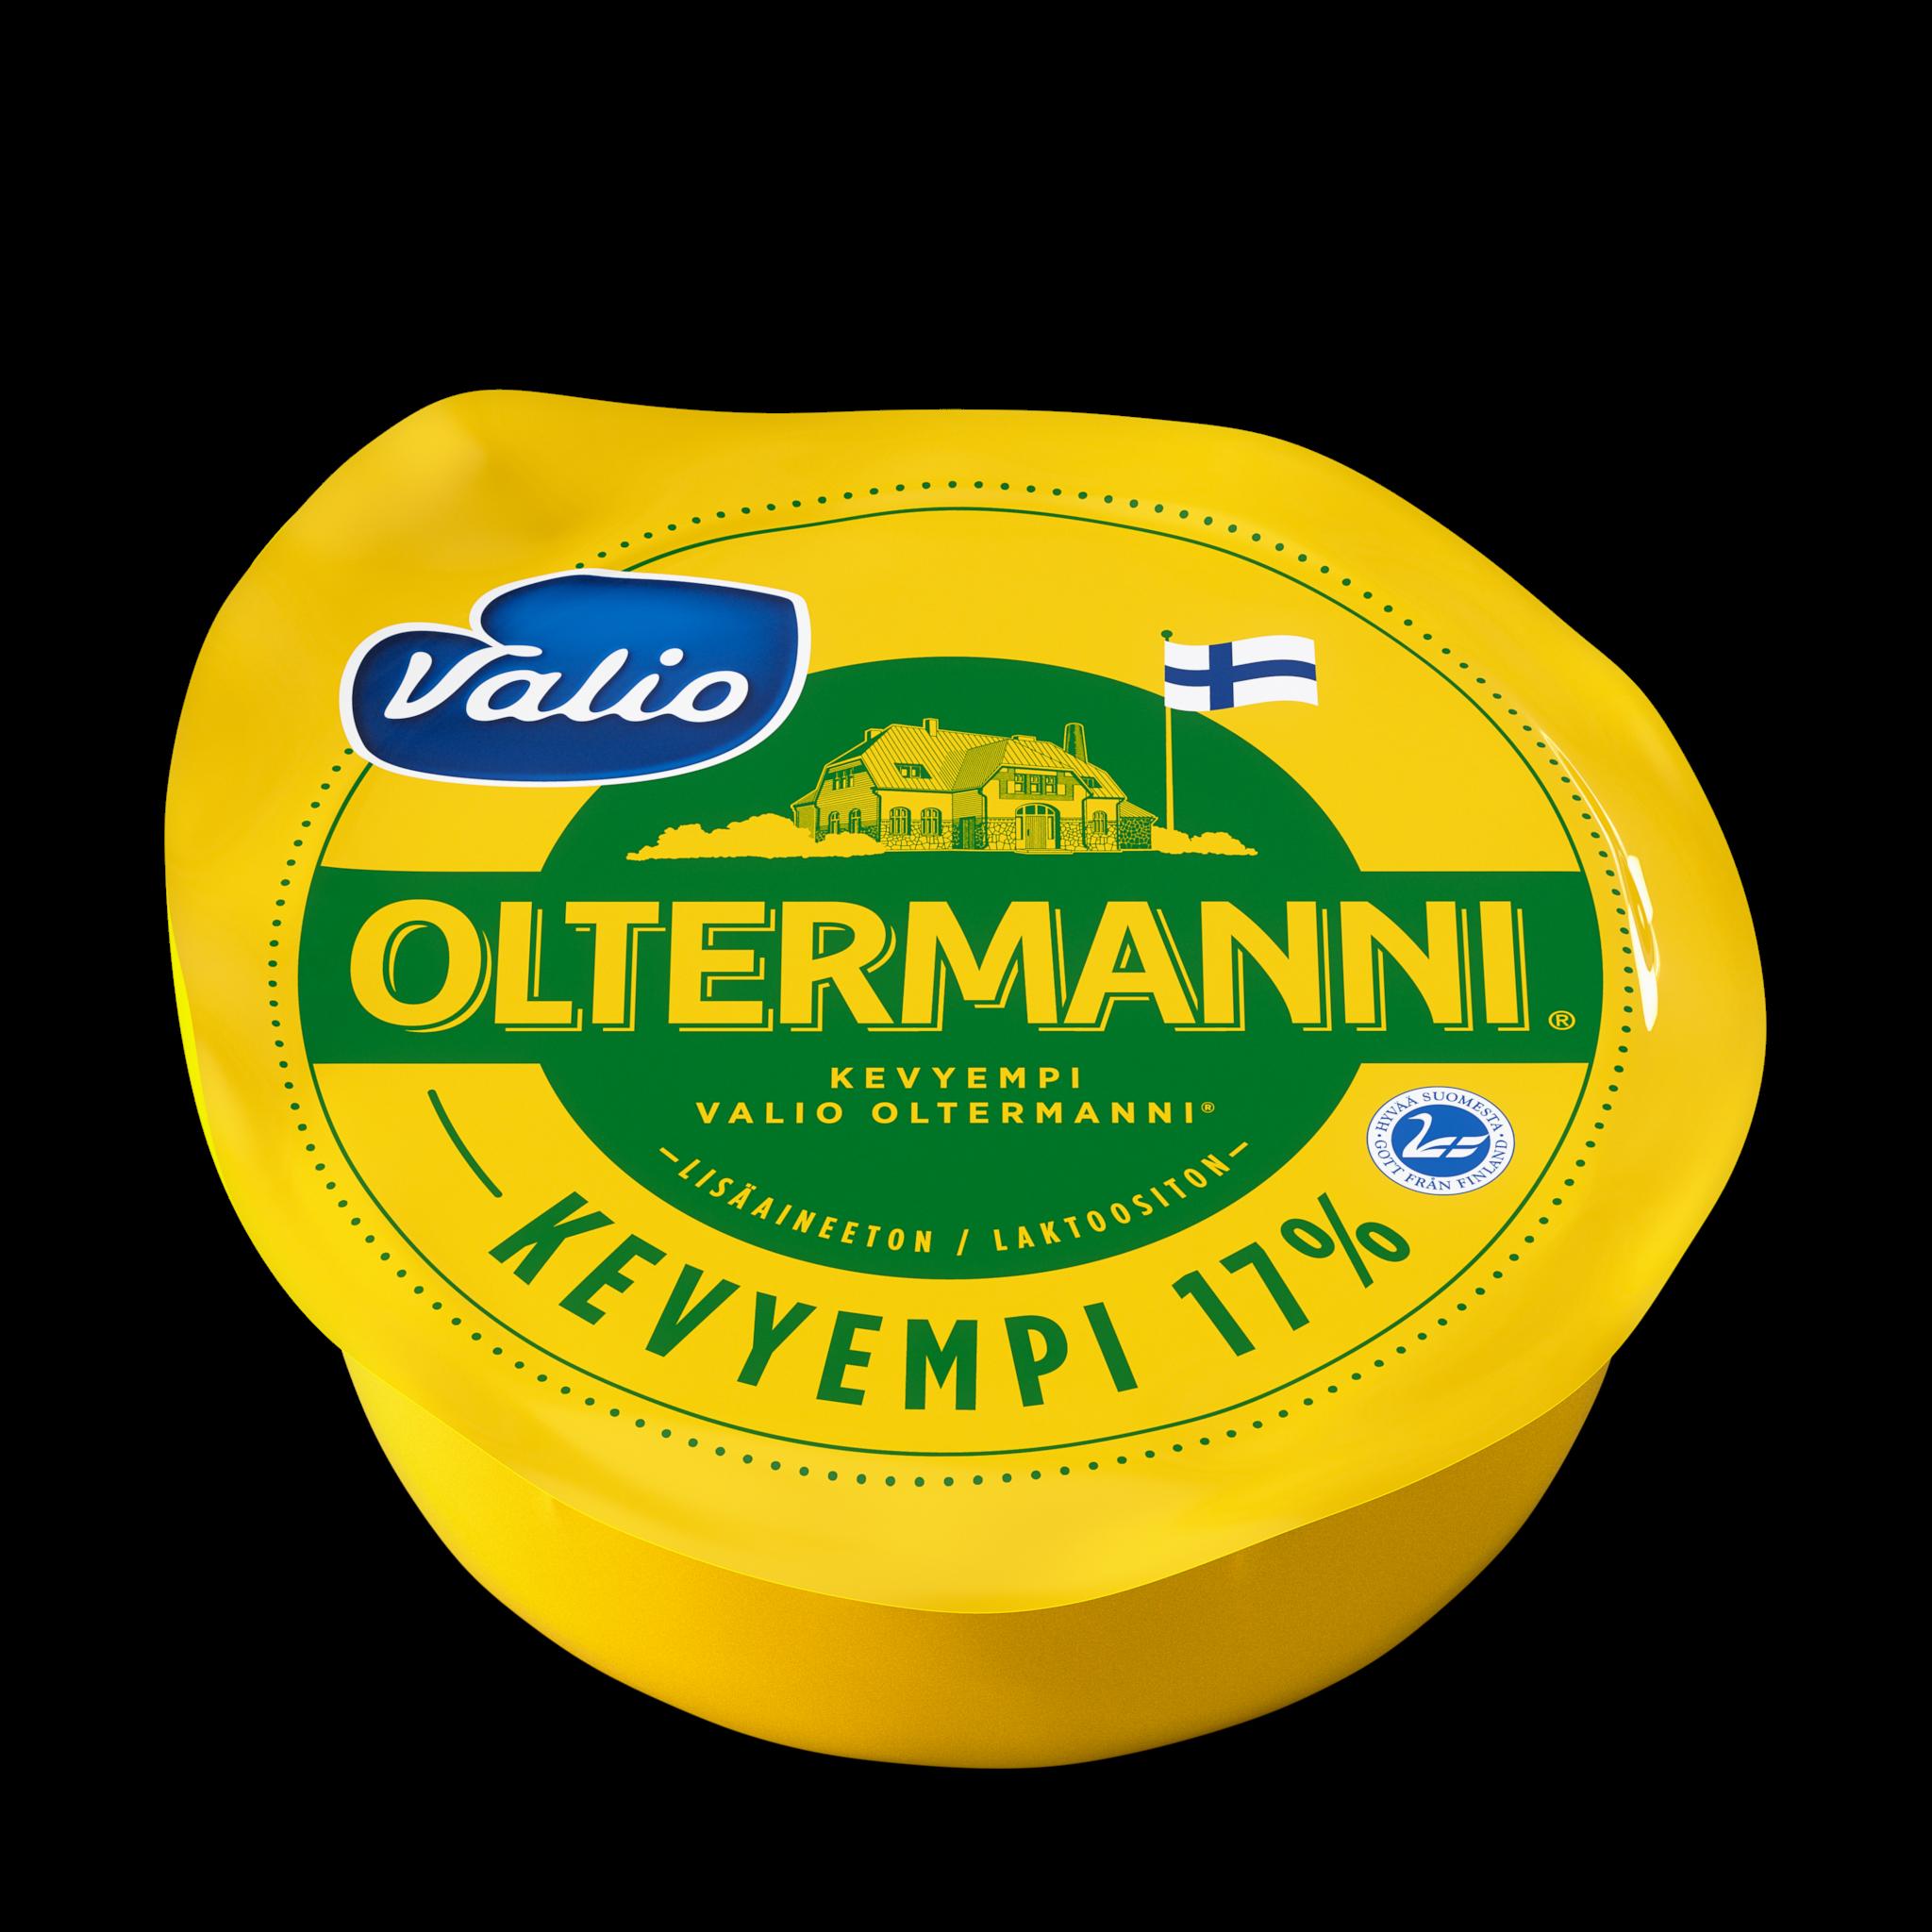 Valio Oltermanni® 17 % kermajuusto